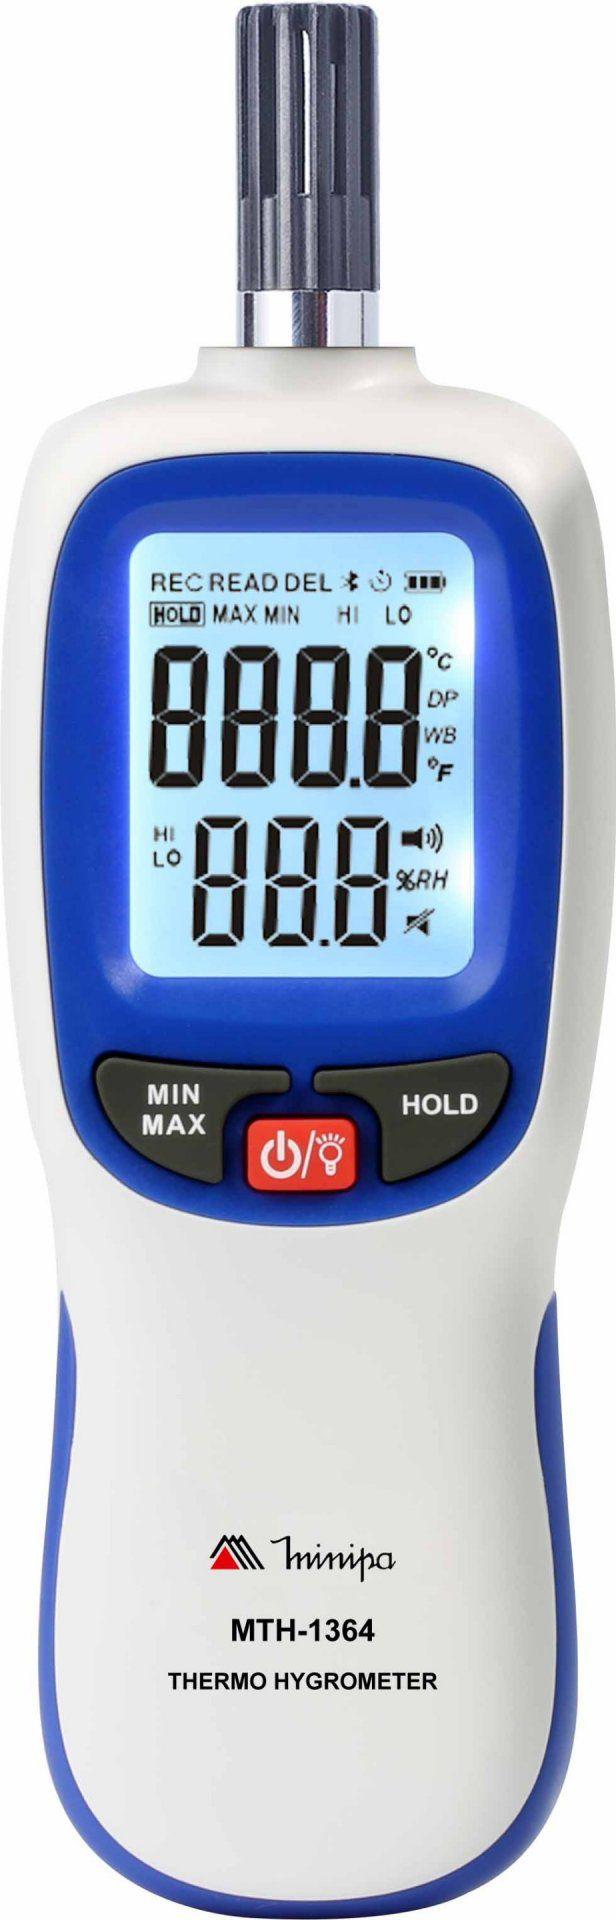 Termo-Higrômetro Digital Minipa MTH-1364  - MRE Ferramentas